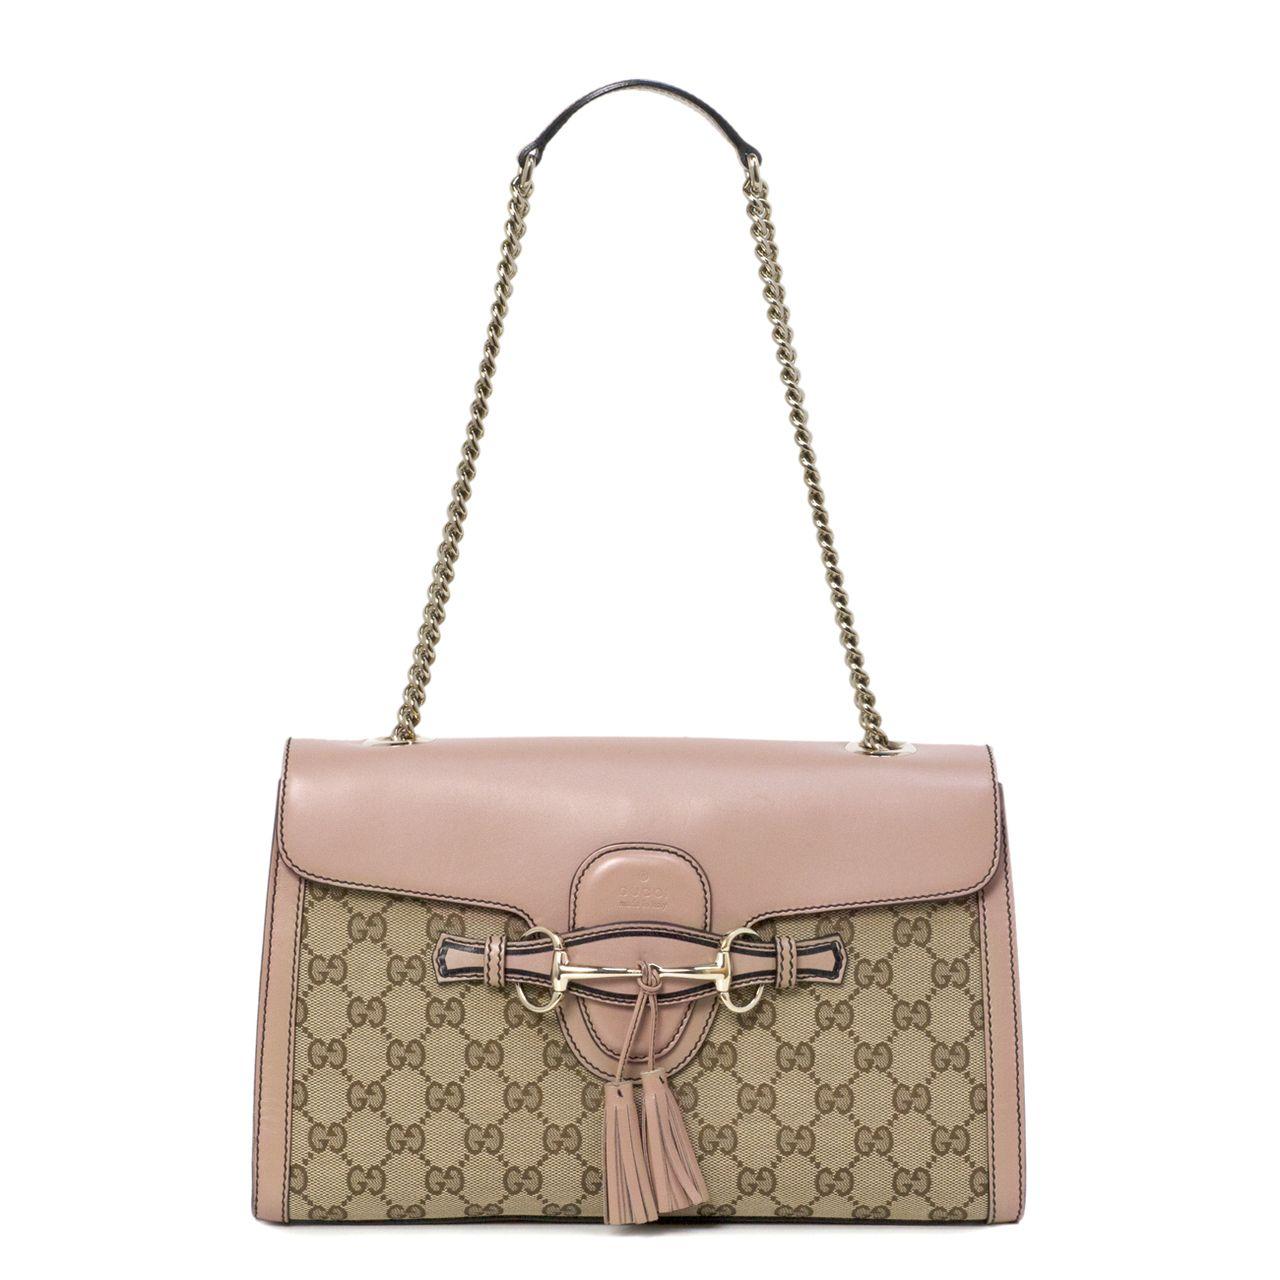 4bb9d0b2d8f Gucci Monogram Canvas Emily Chain Shoulder Bag - modaselle   Gucci ...